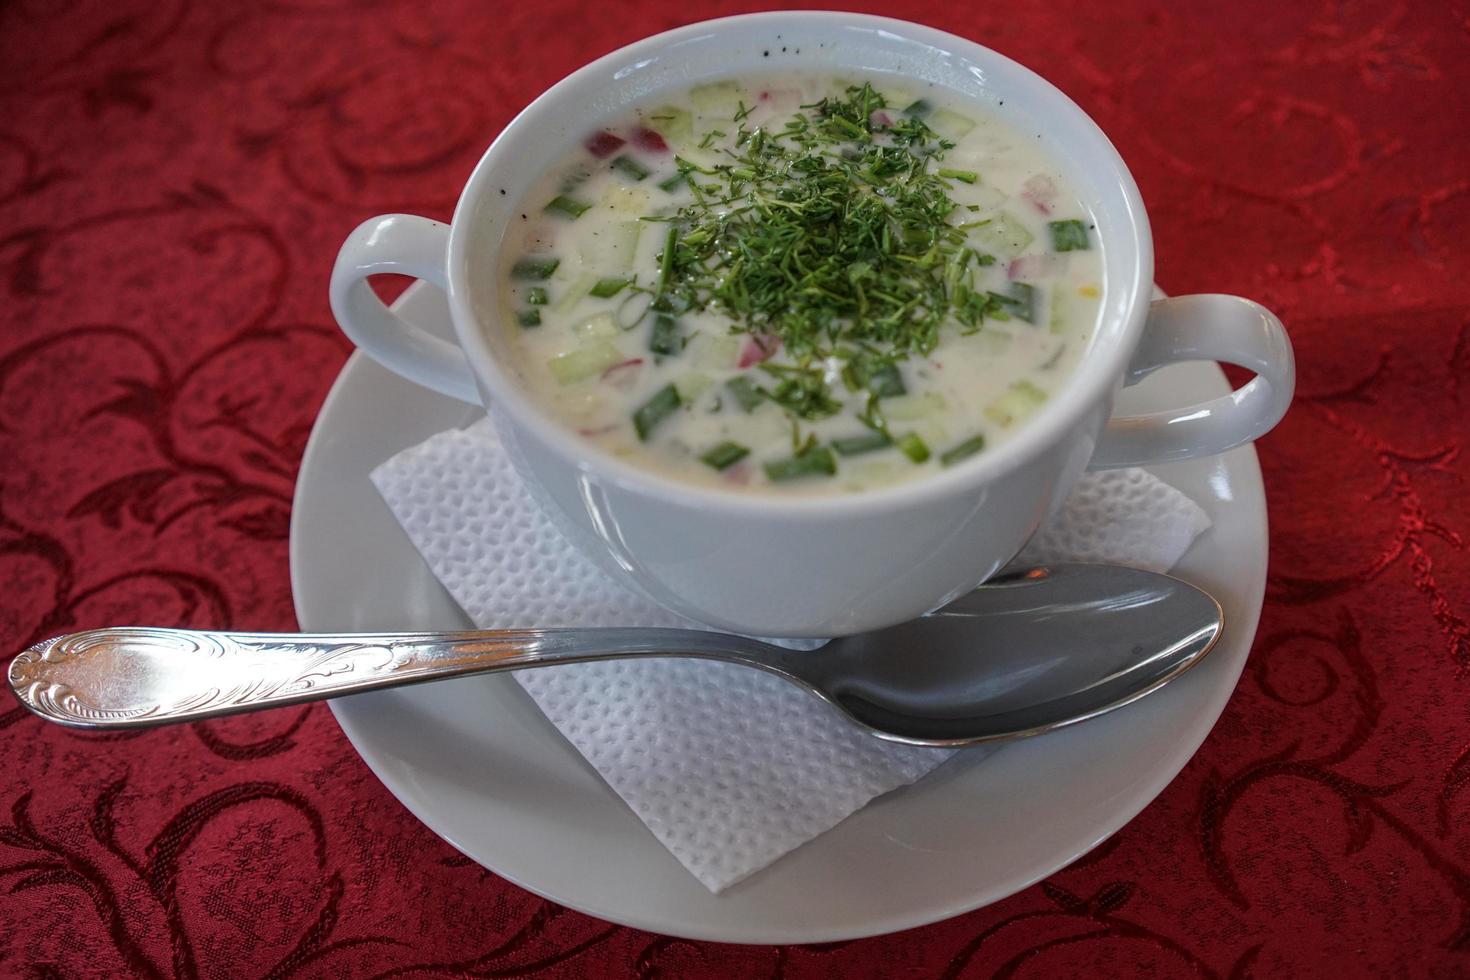 comida rusa nacional okroshka sopa fría en un plato blanco foto